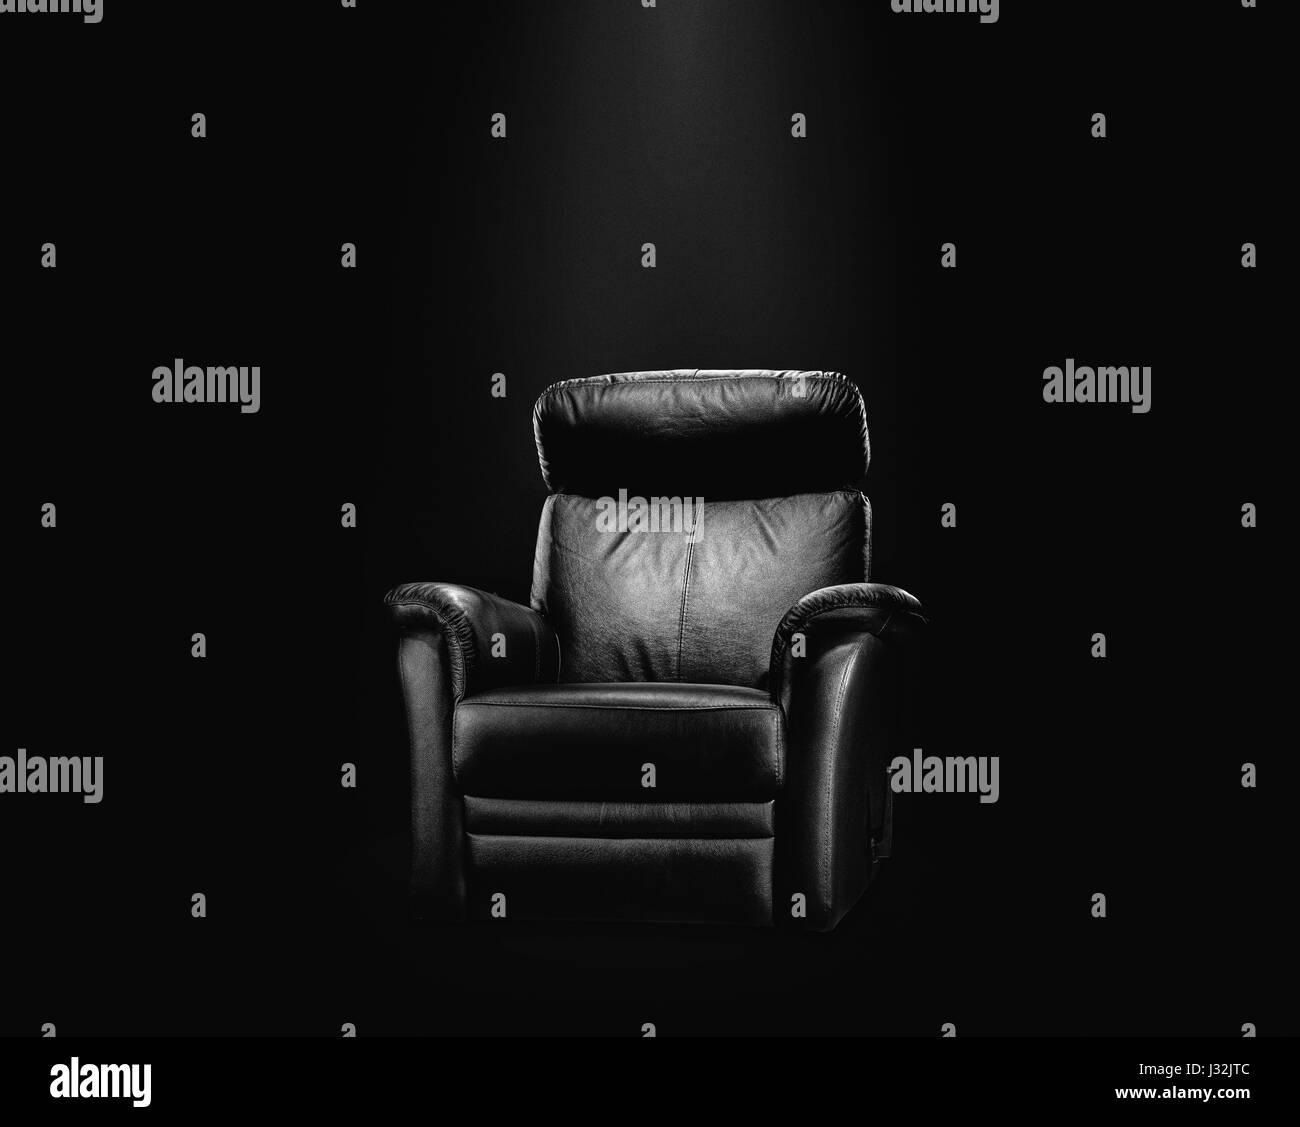 Black leather armchair in spotlight, dark background - Stock Image